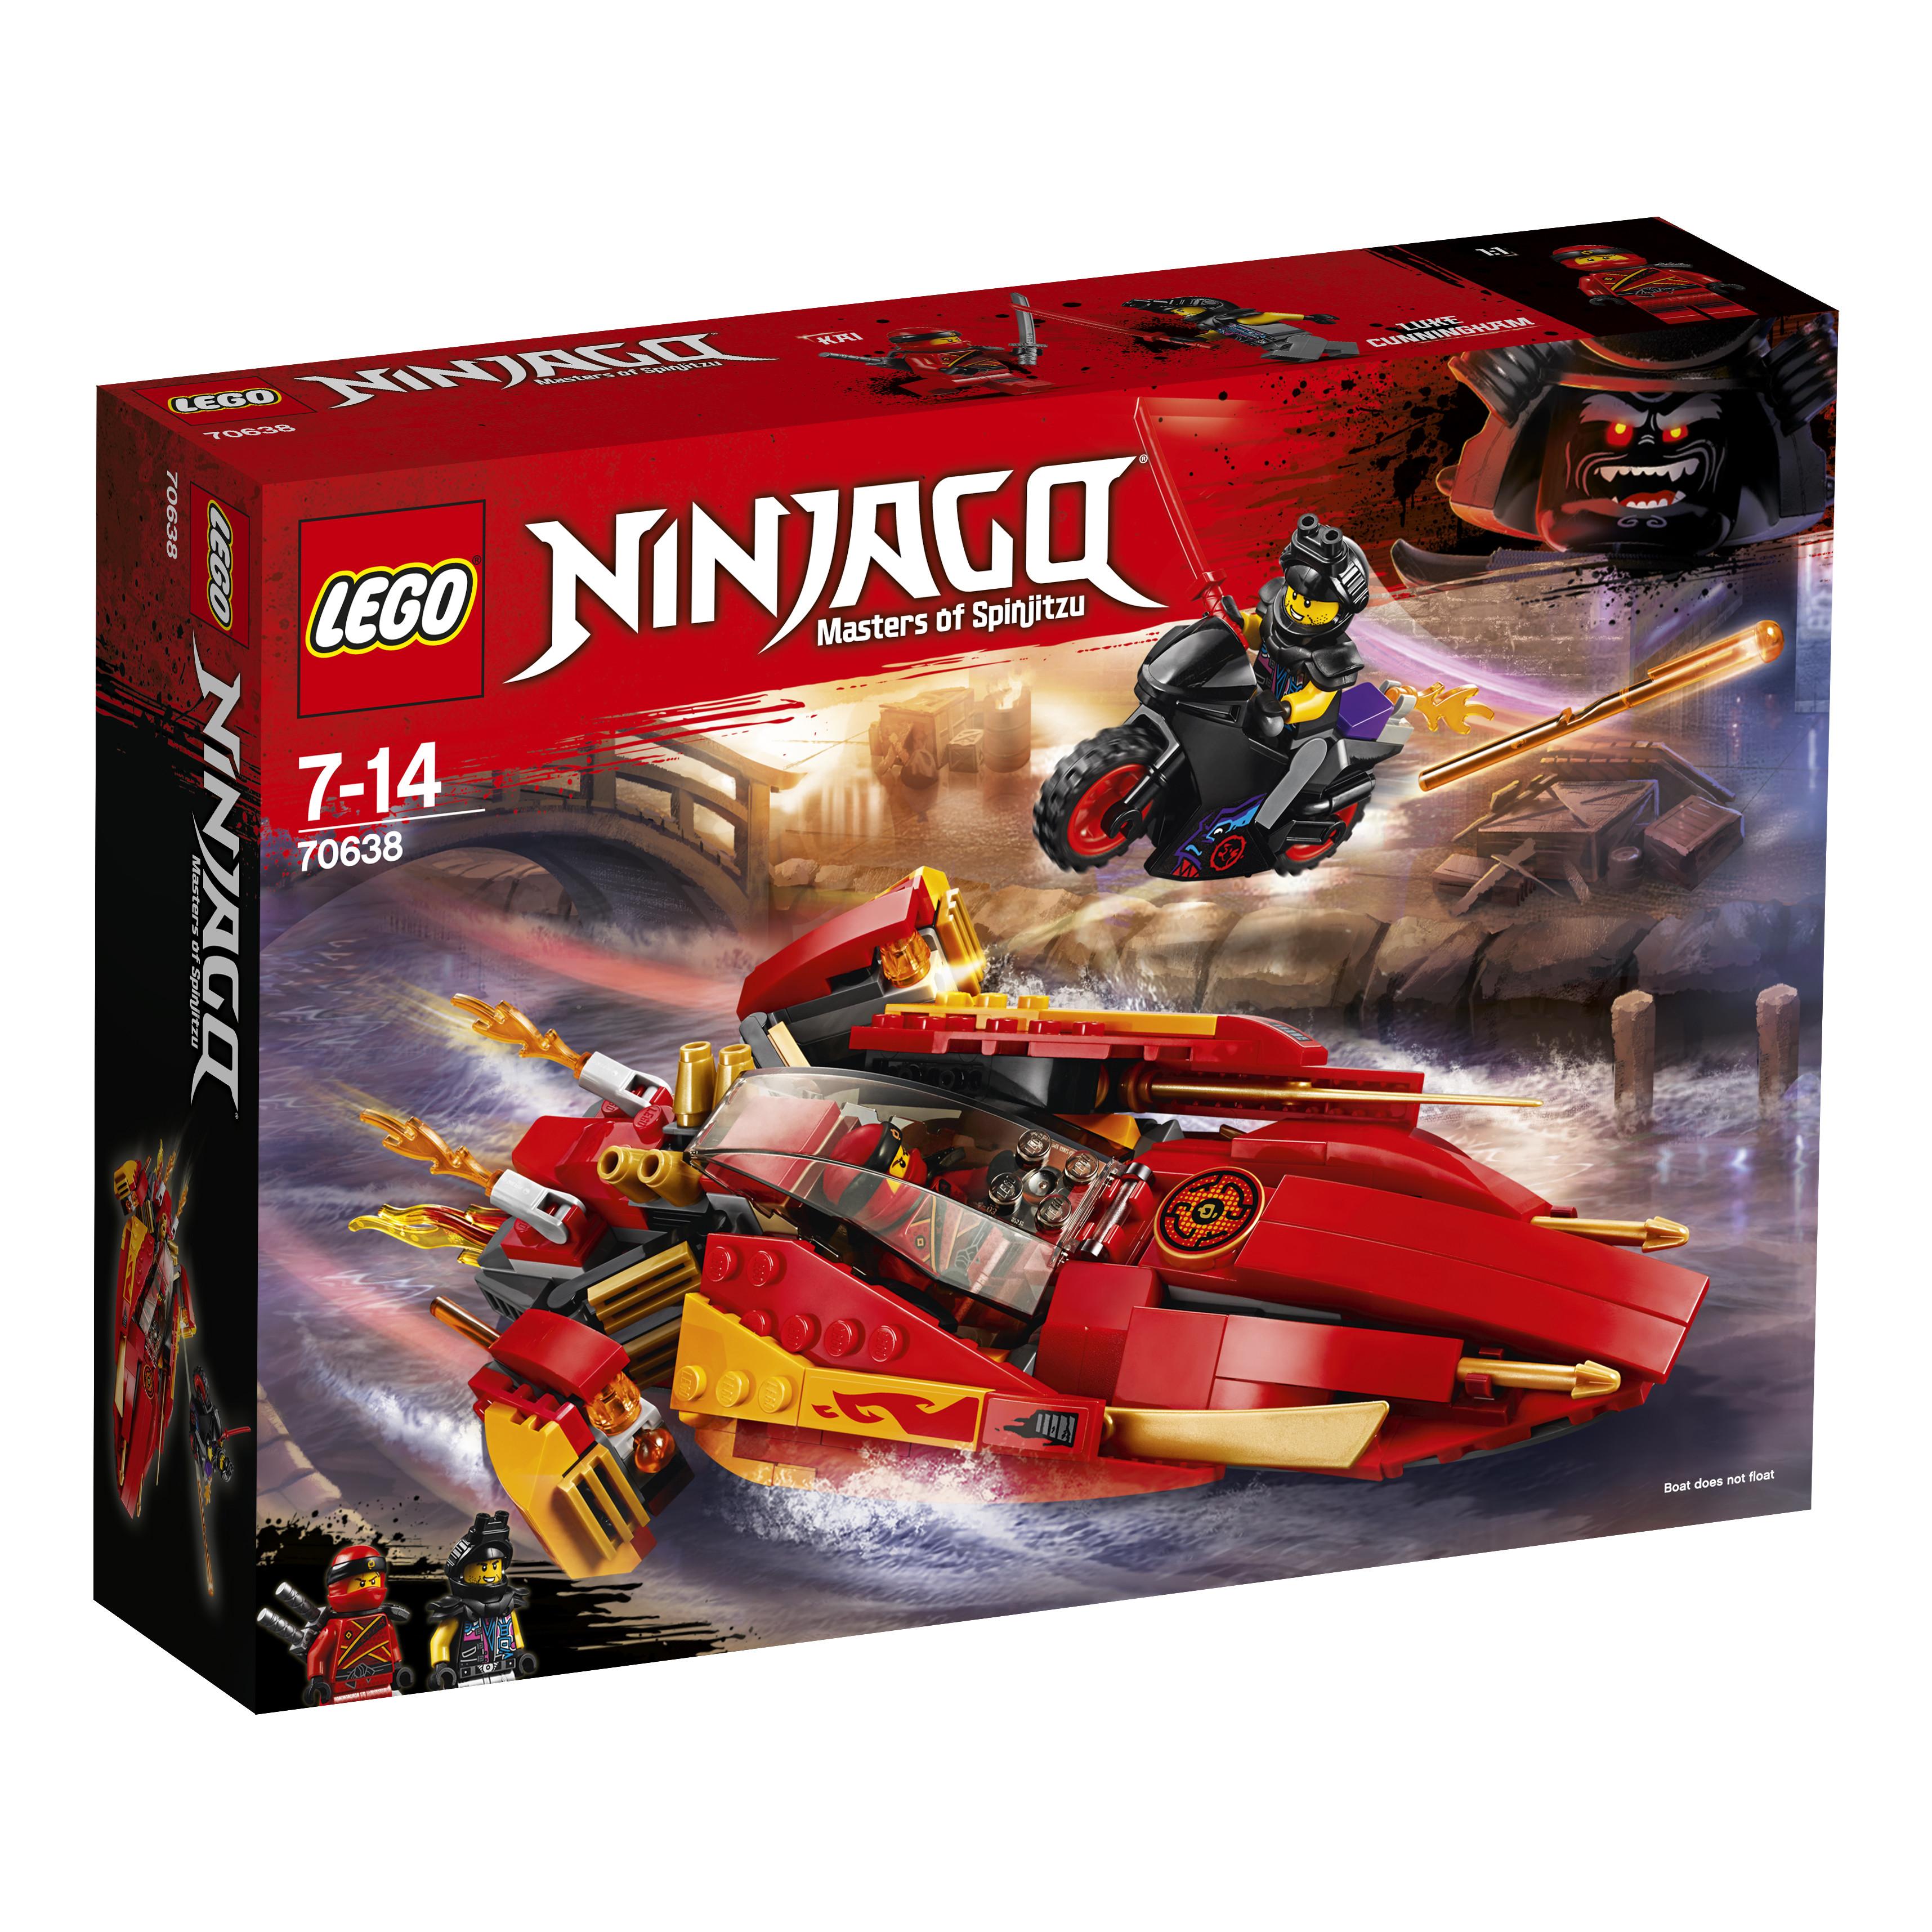 Конструктор LEGO Ninjago 70638 Катана V11 конструктор lepin ninjago акула гармадона 929 дет 06067